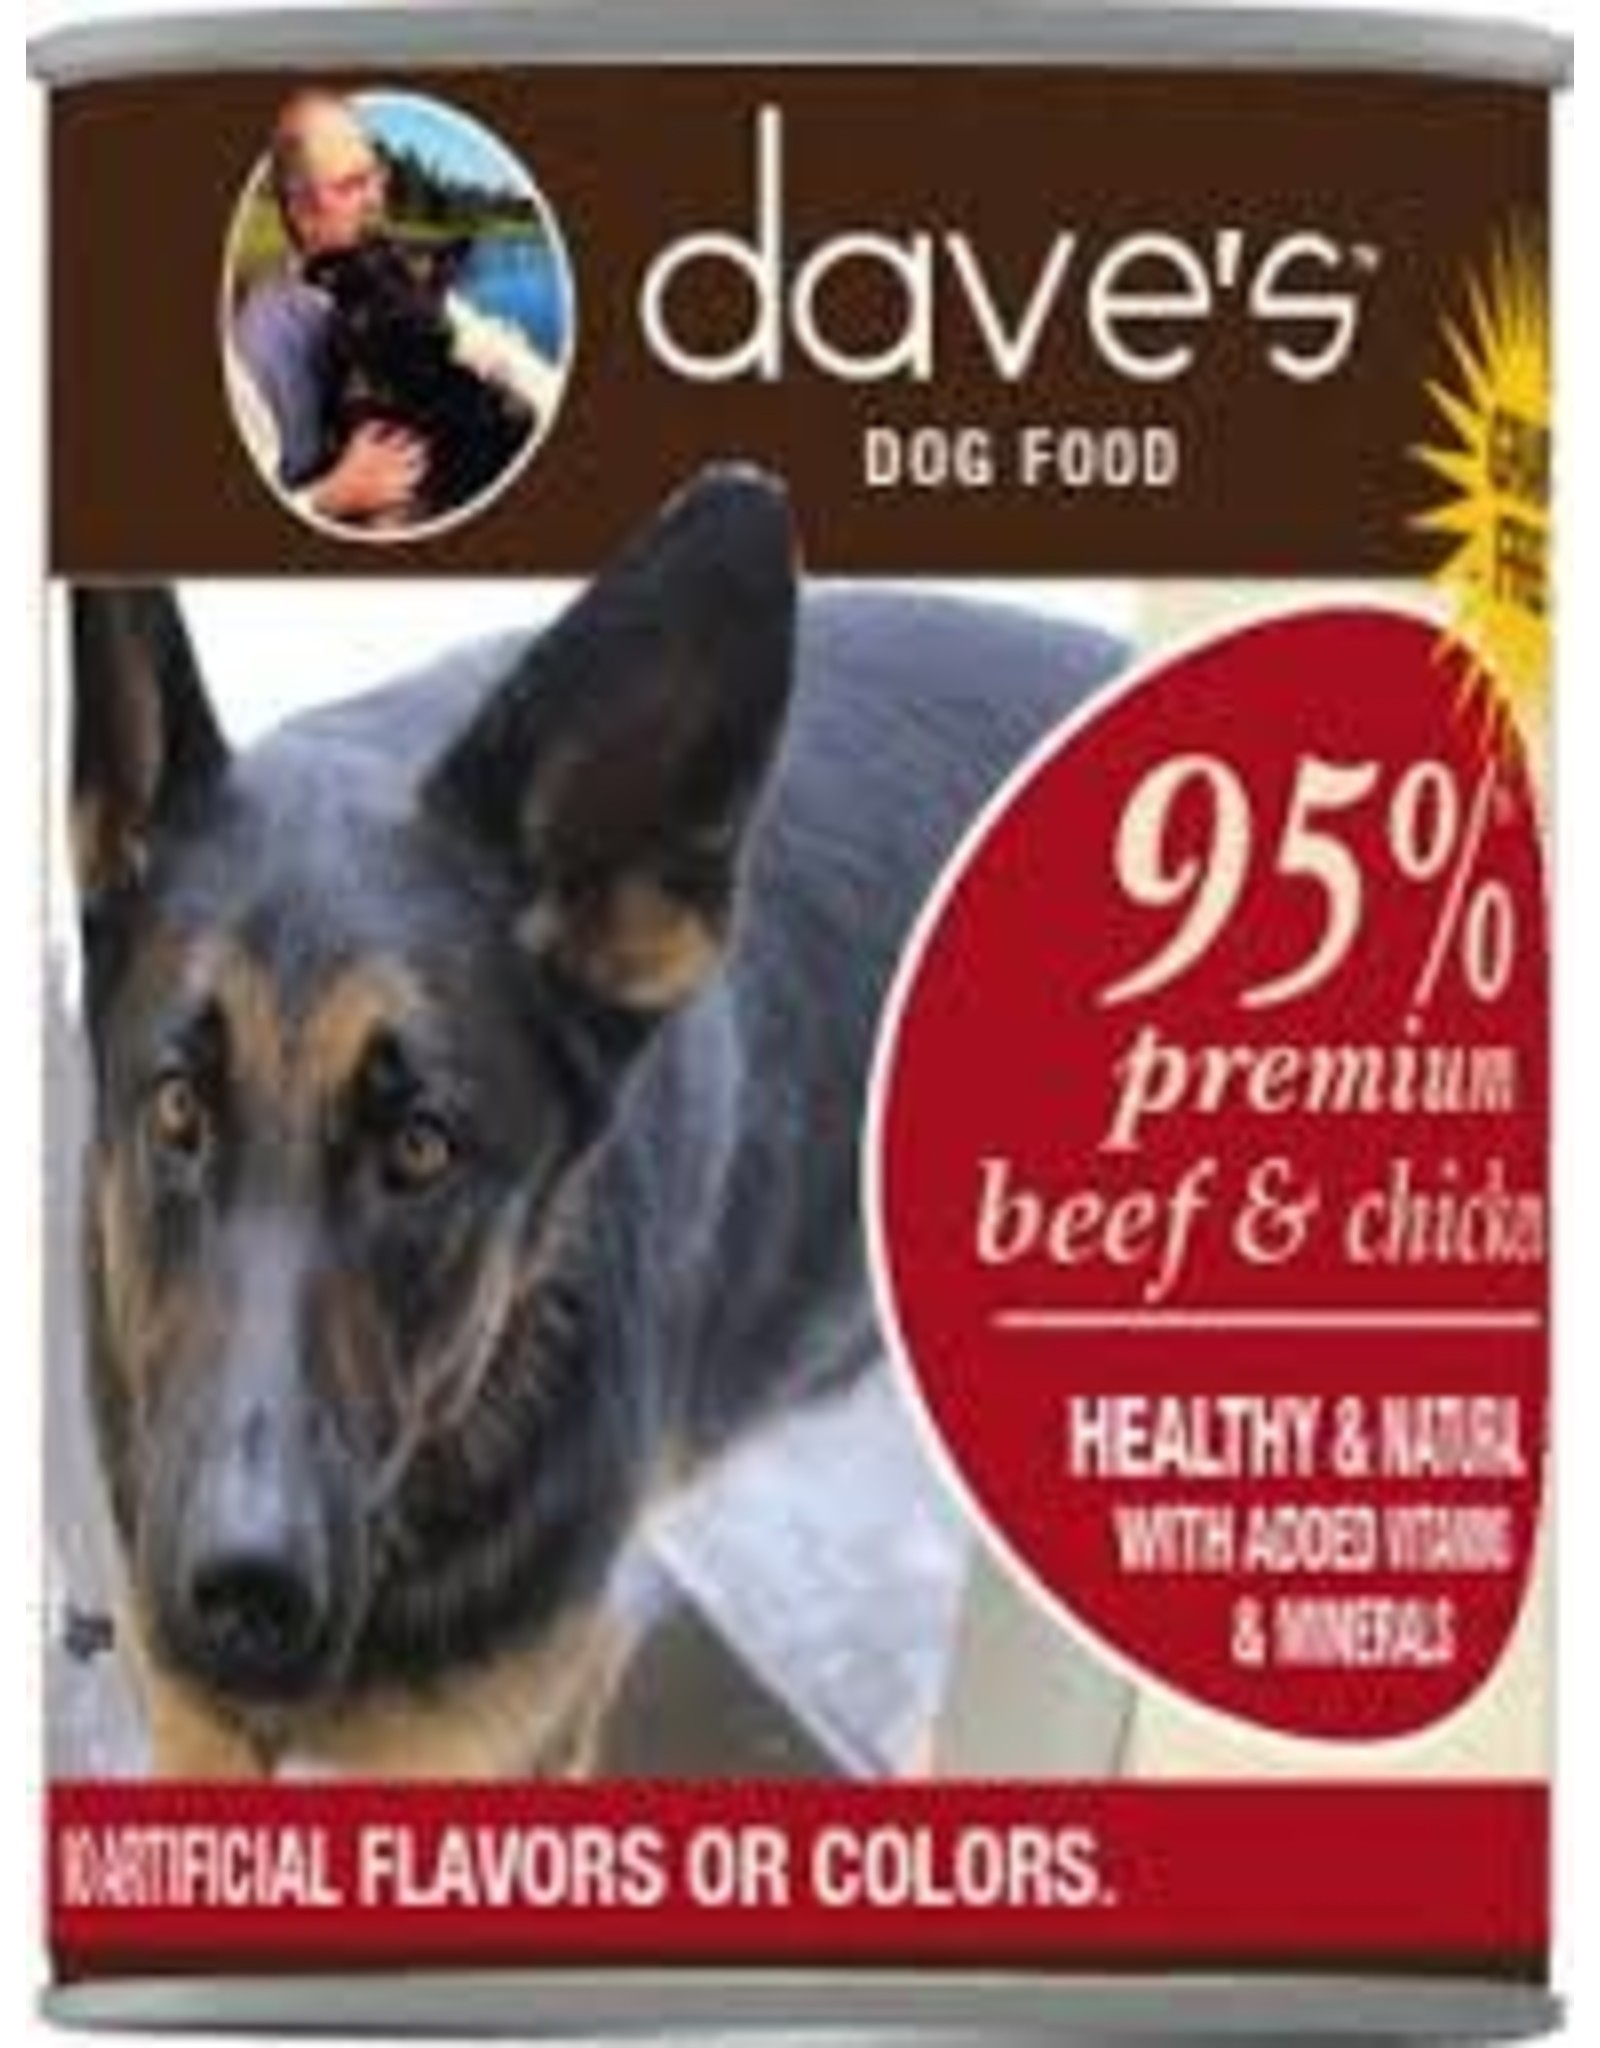 DAVE'S PET FOOD DAVE'S 95% BEEF & CHICKEN 13OZ